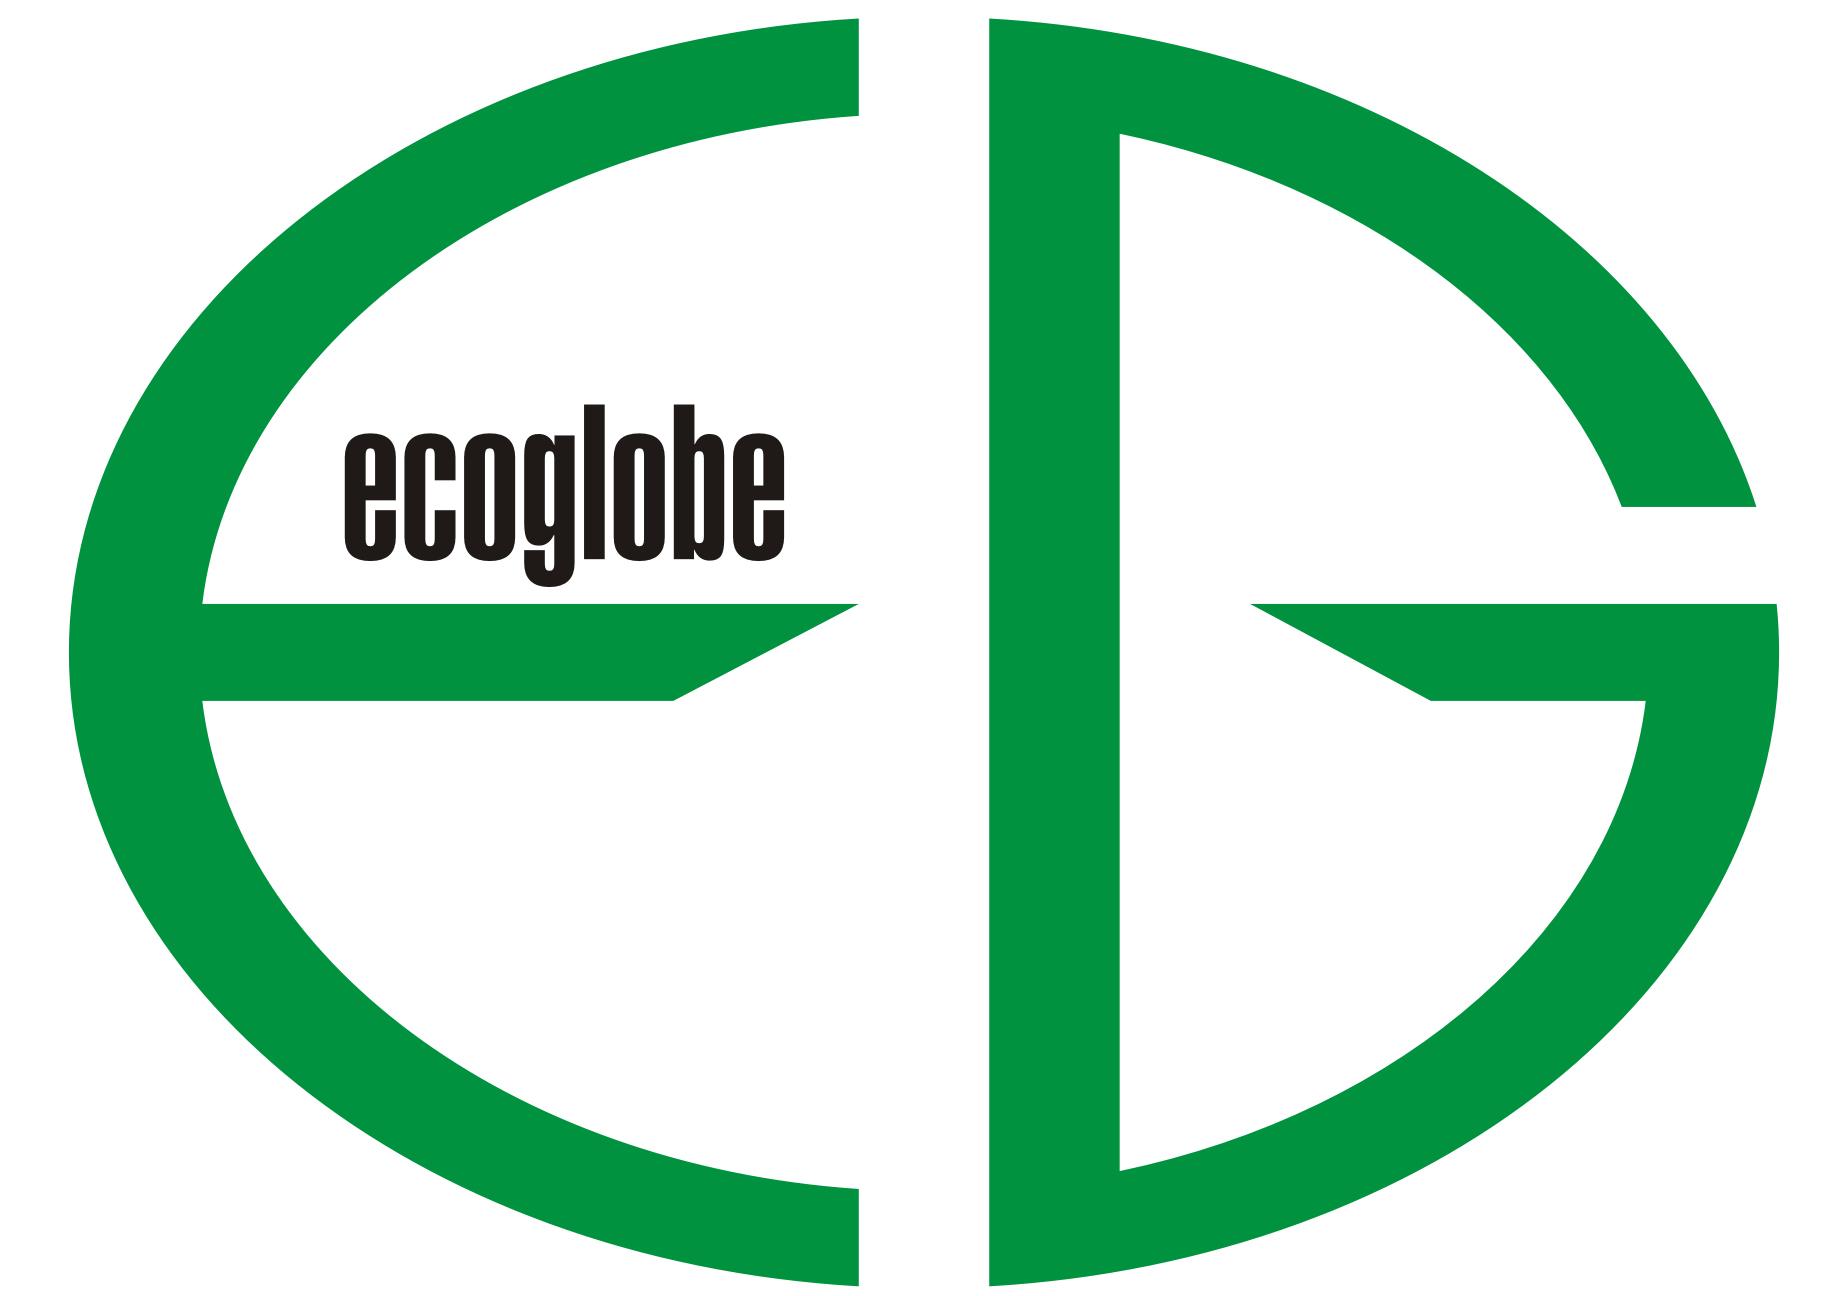 EcoglobeLogo